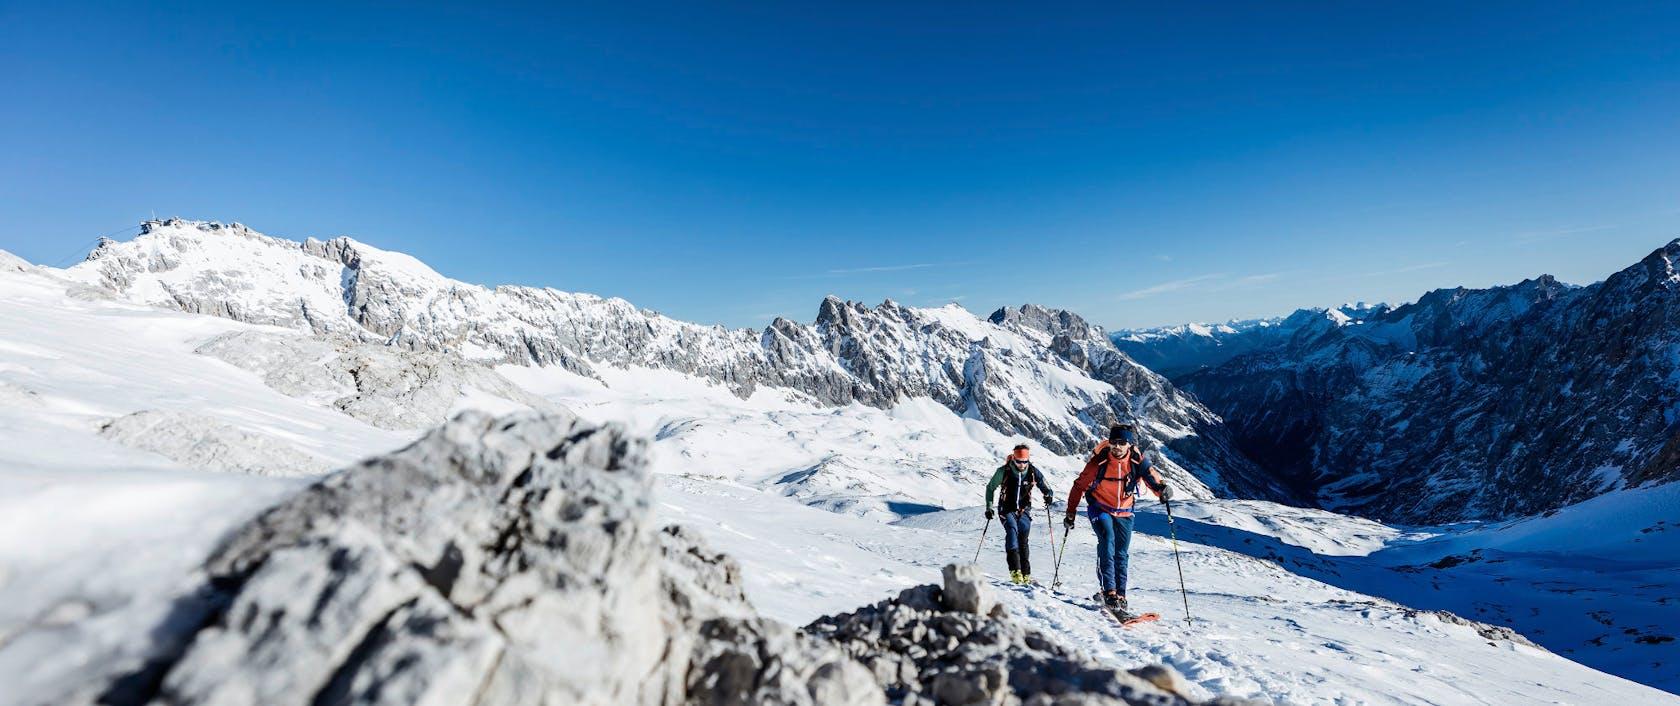 ortovox skitouring shop